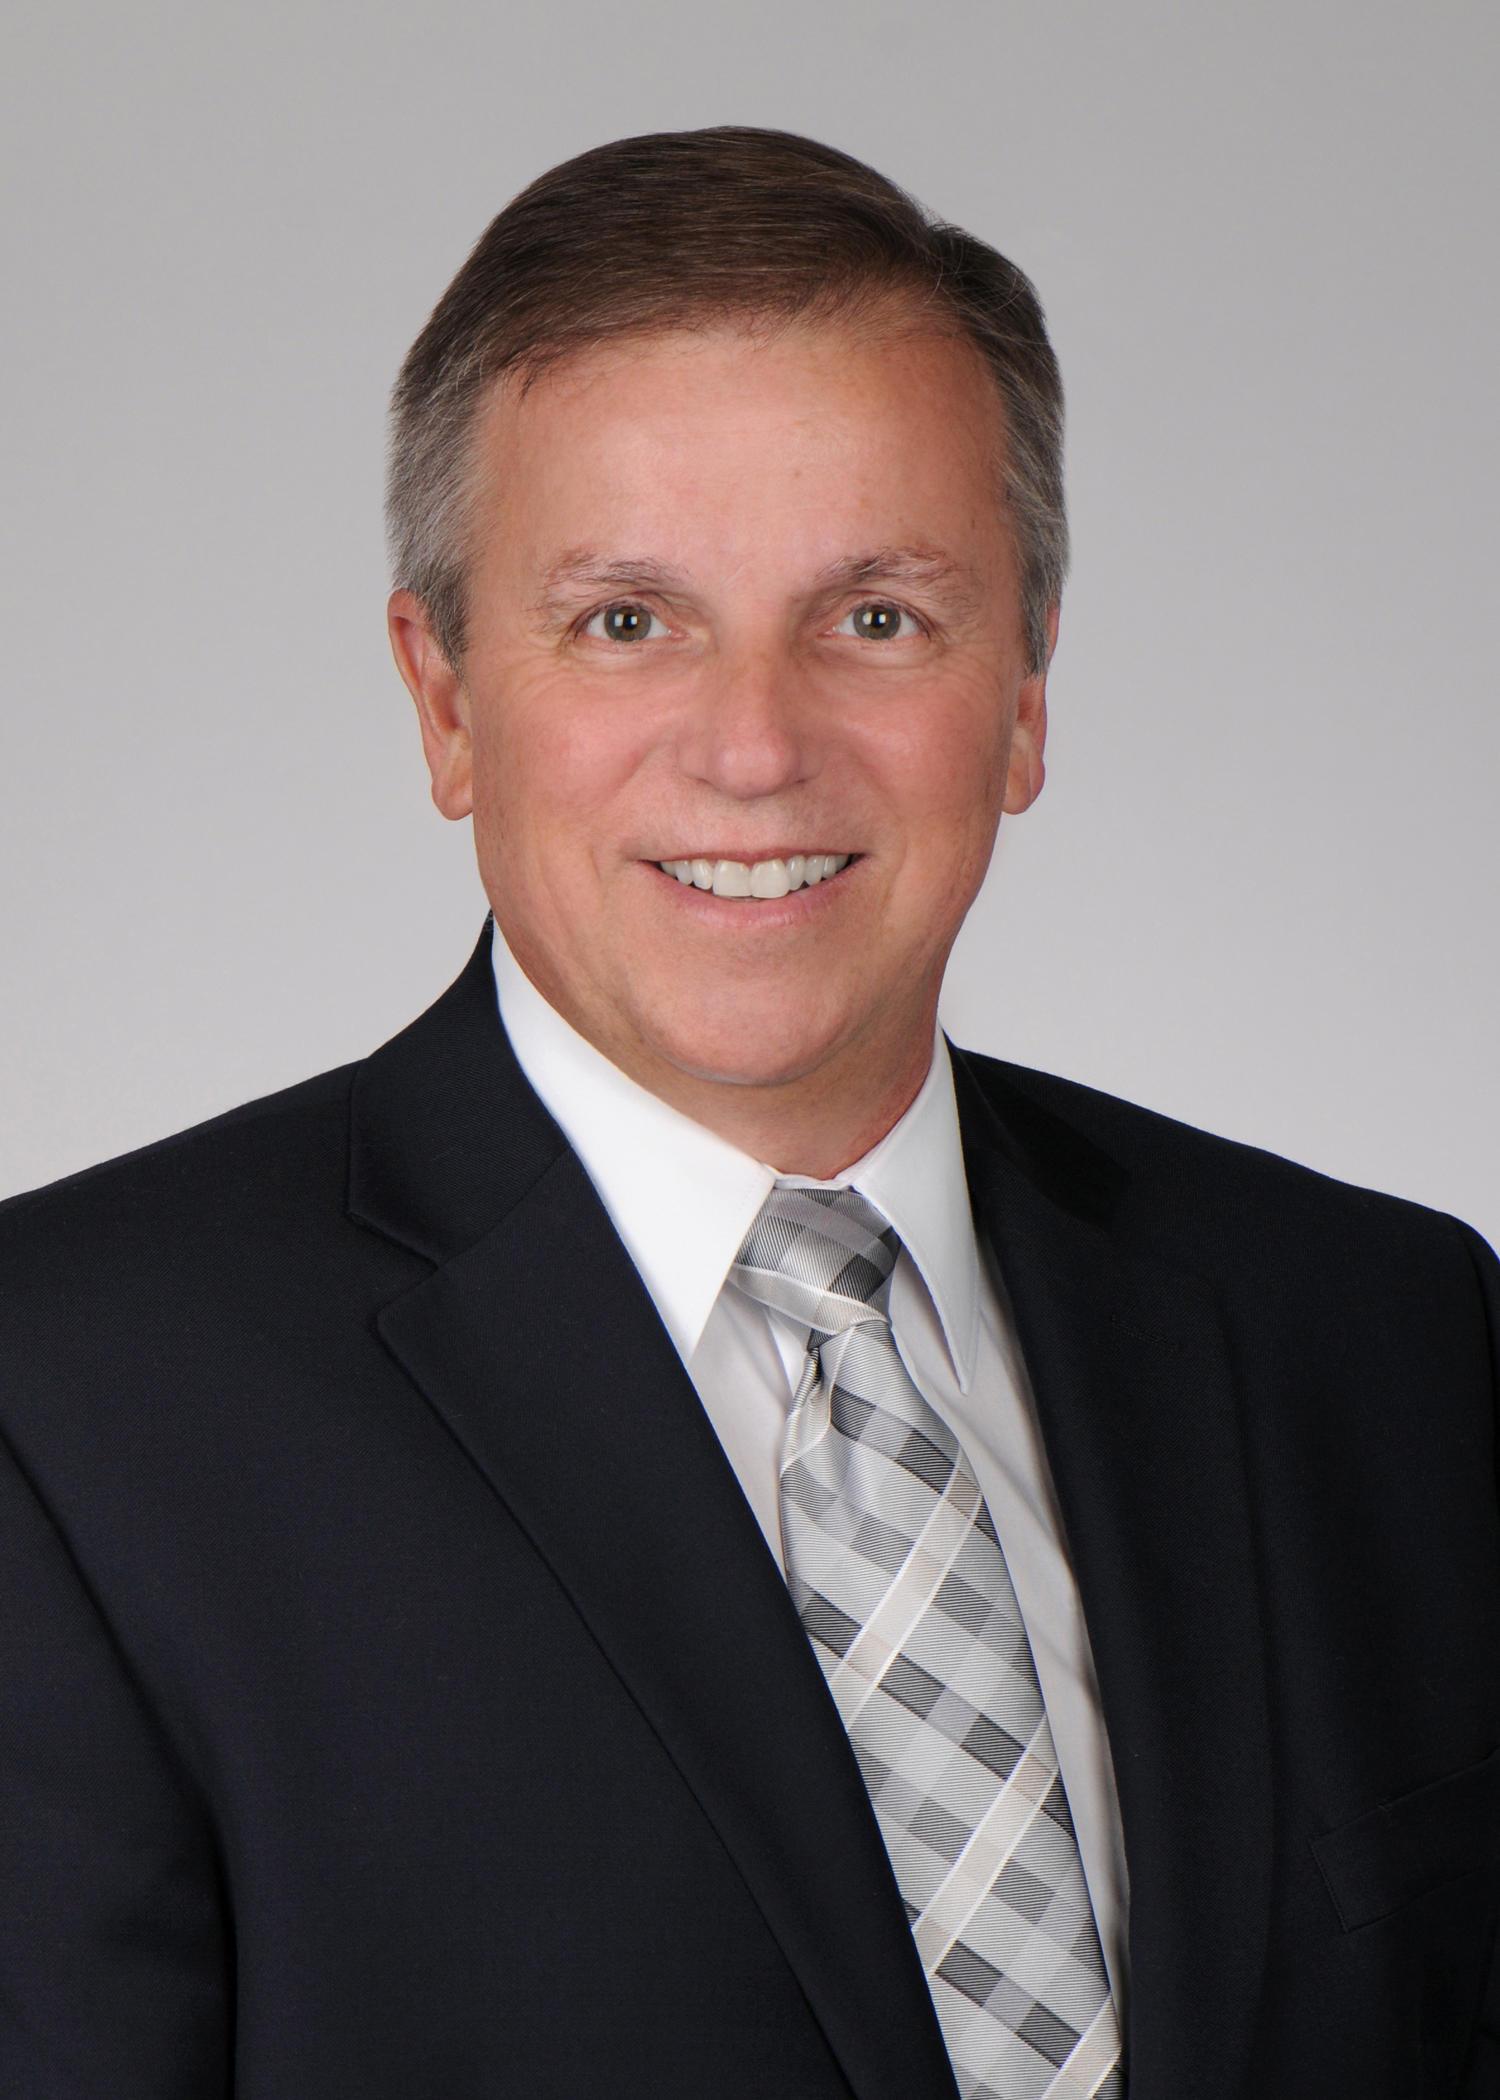 Cristian Mauricio Thomae, MD